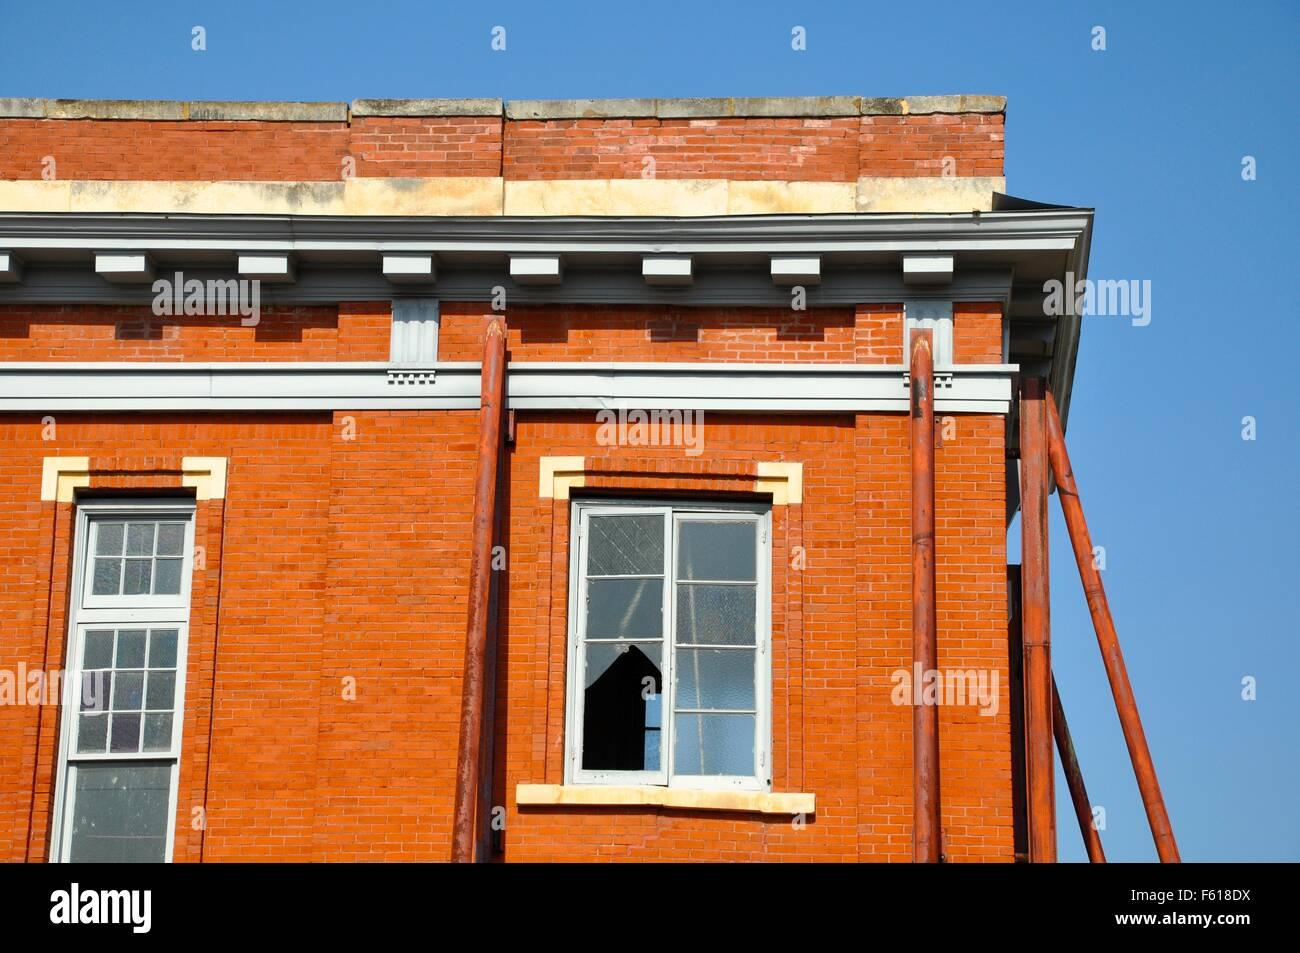 COURT HOUSE in Livingston, Texas - Stock Image